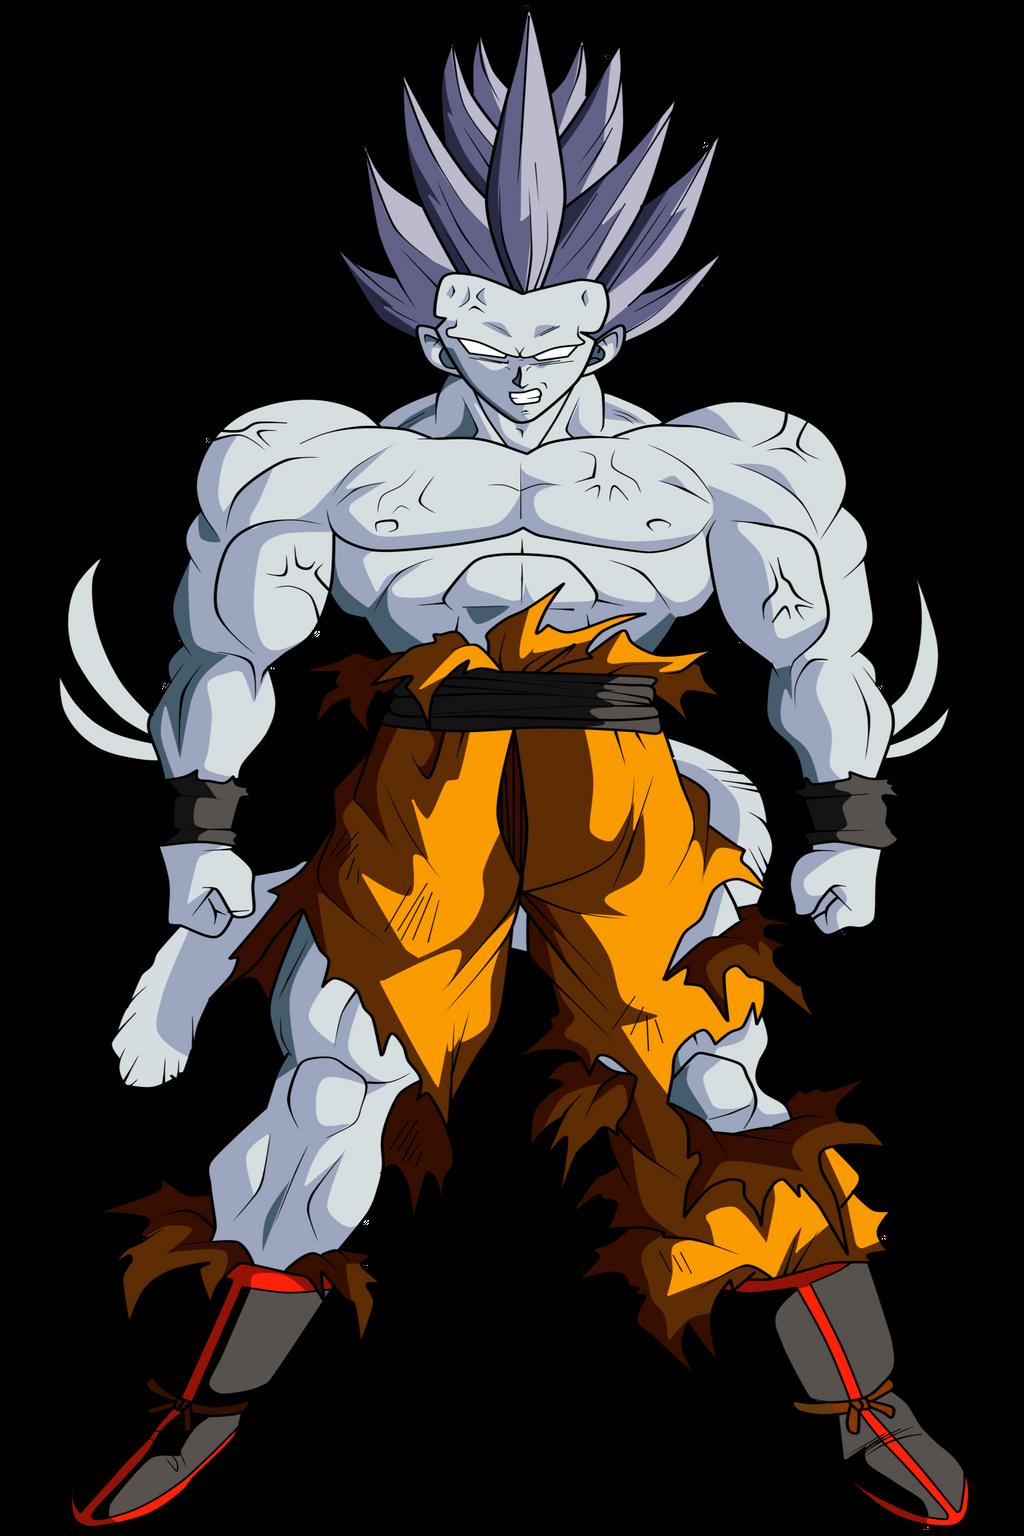 Goku Super Saiyan 10 By Chronofz On Deviantart In 2020 Dragon Ball Super Manga Dragon Ball Image Dragon Ball Art